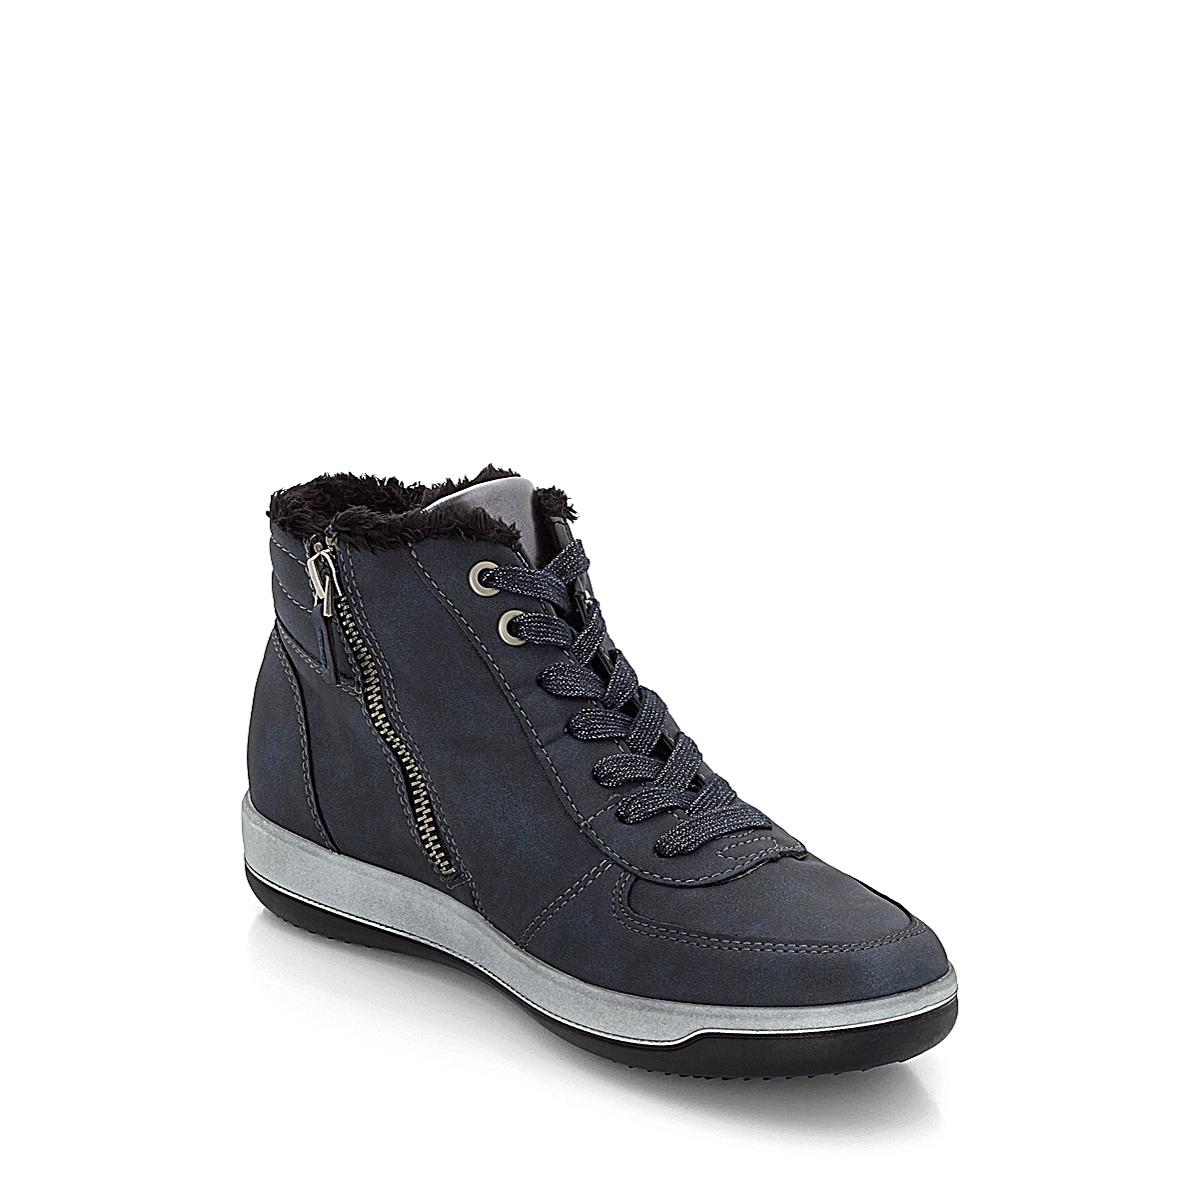 22 Blau High 67 By 68730 Top Damen Jenny Titan Ara Sneaker kXOPuZi